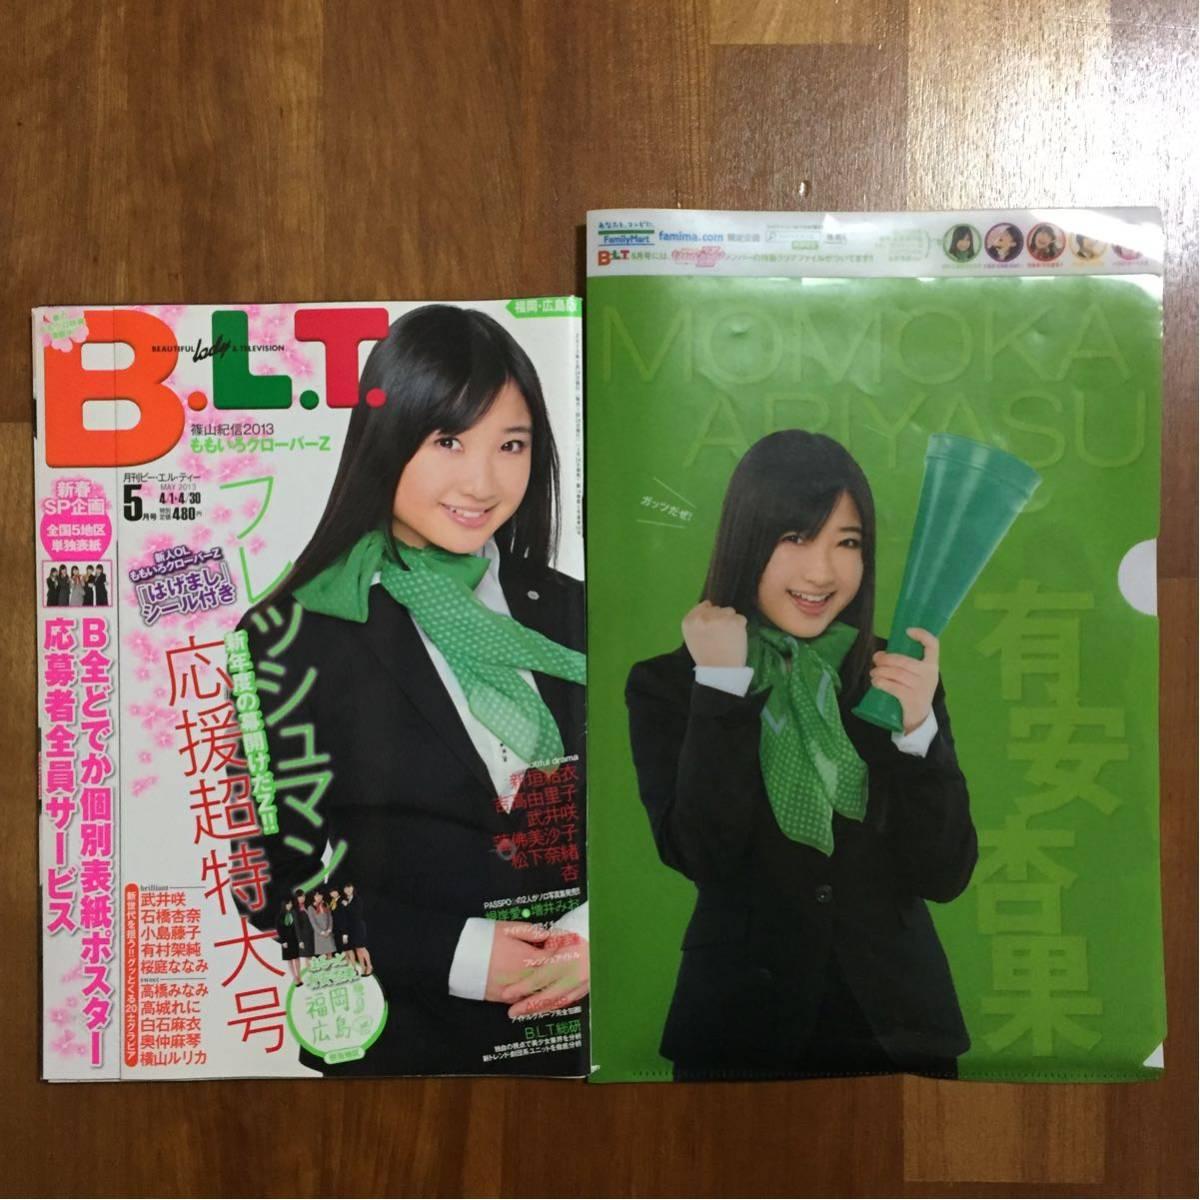 B.L.T.福岡広島版 2013年 05月号 有安杏果 クリアファイル付き